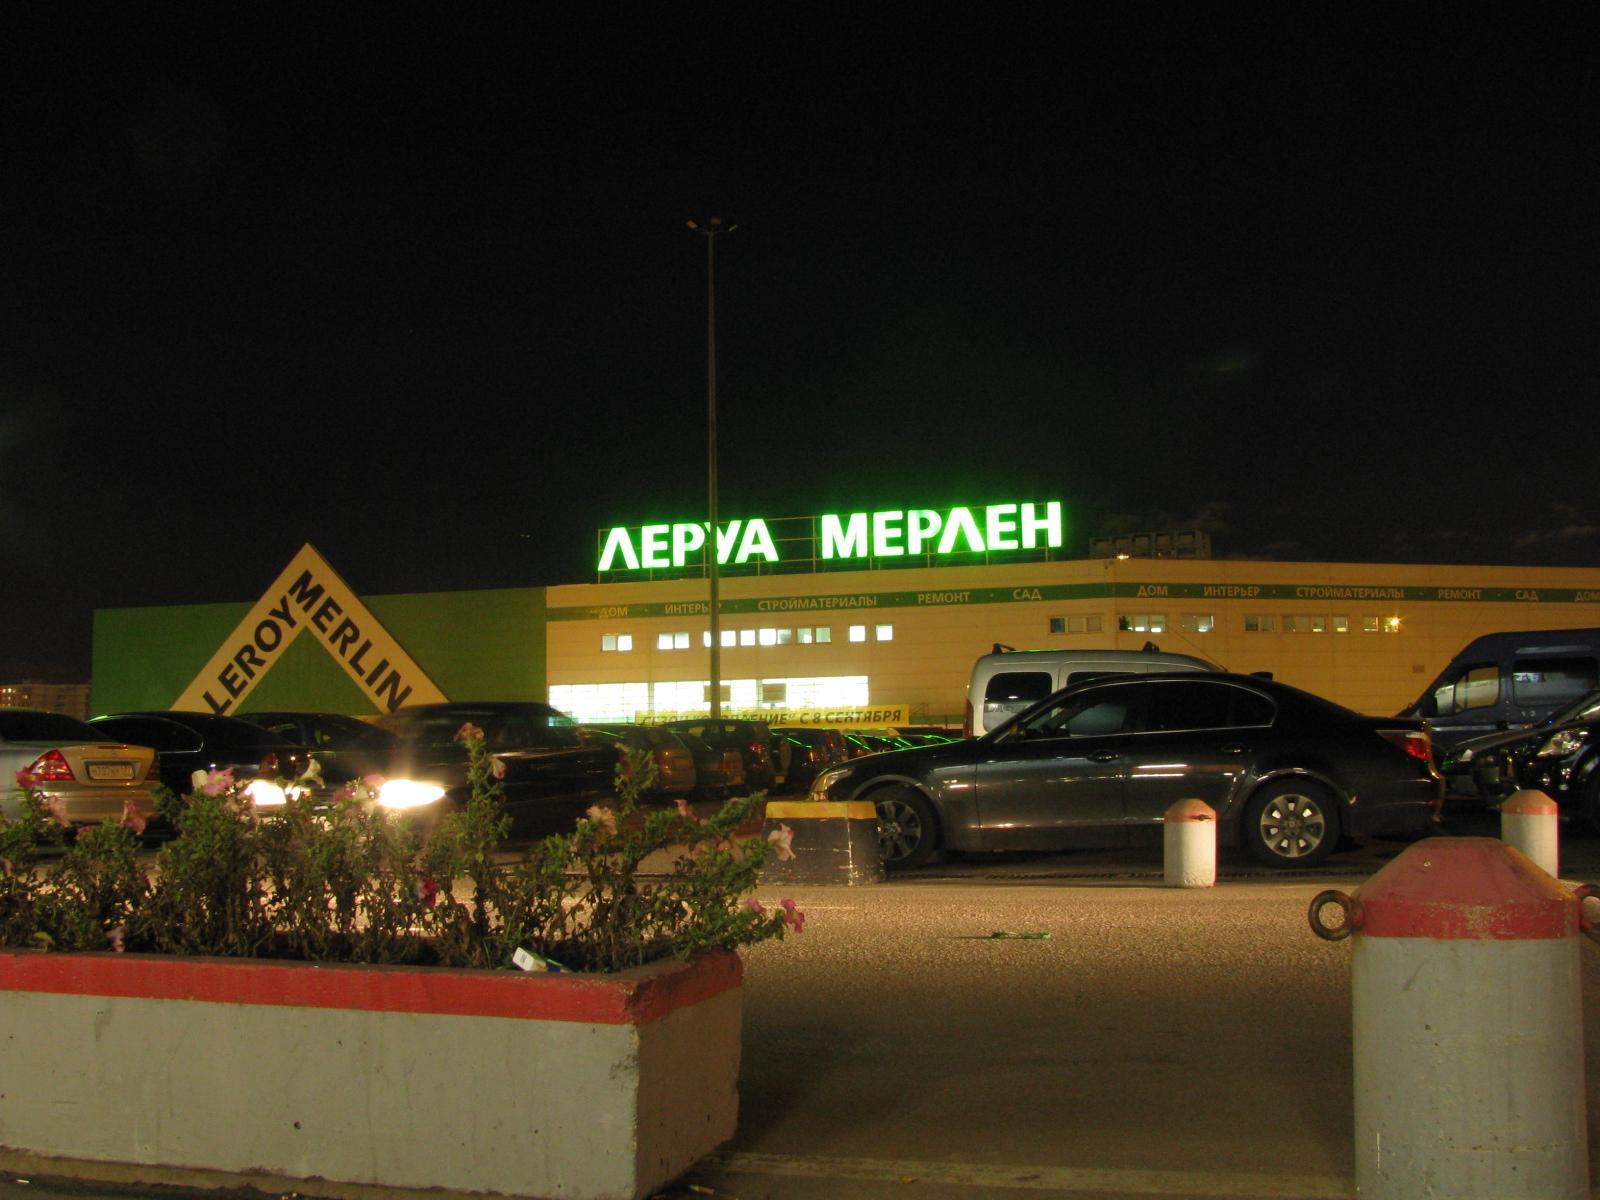 Файл:Магазин Леруа Мерлен в Москве.jpg: ru.wikipedia.org/wiki/Файл:Магазин_Леруа...